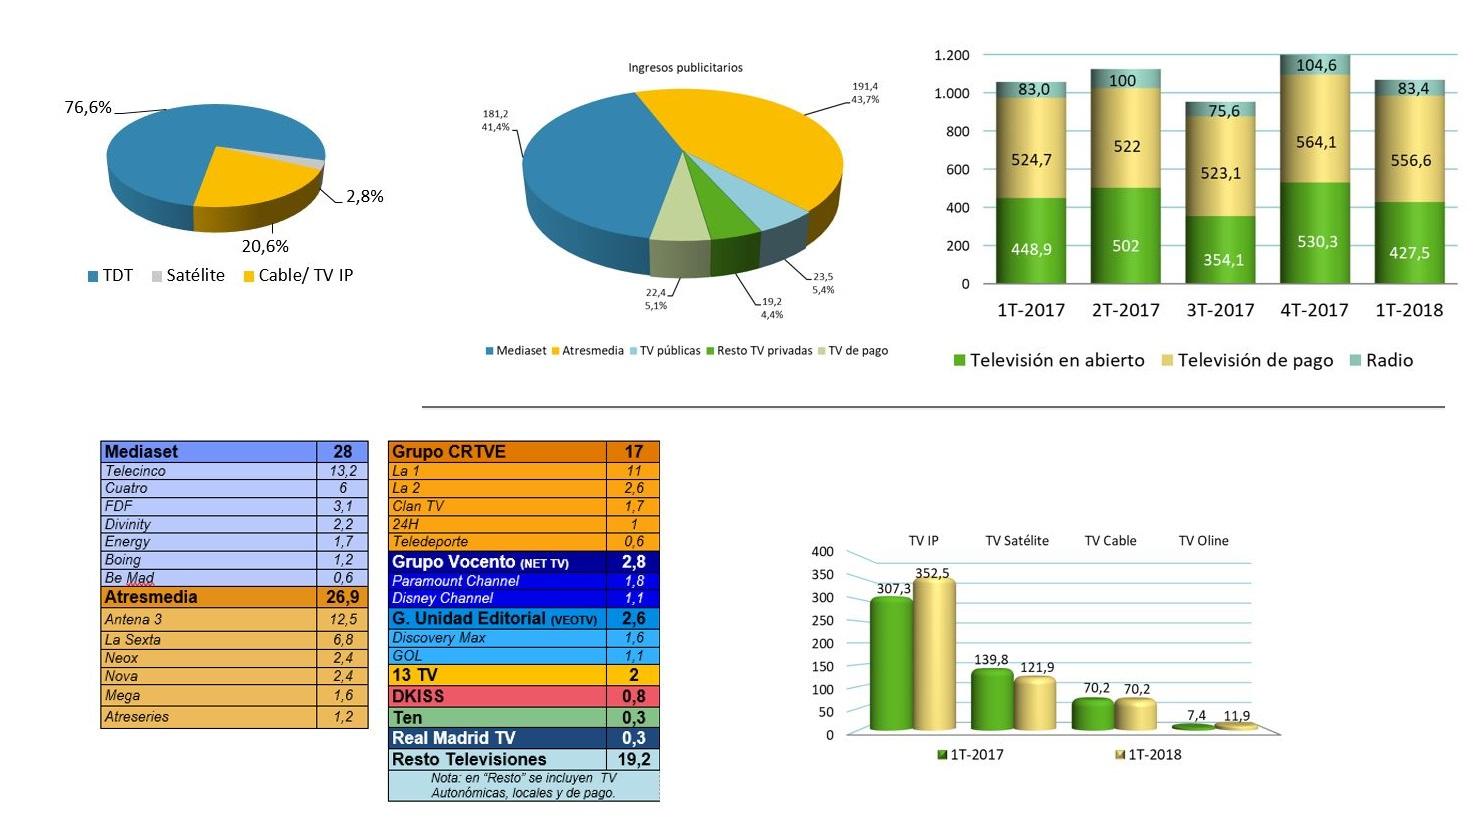 https://www.programapublicidad.com/wp-content/uploads/2018/11/tv-en-abierto-cnmc-data-muy-grande.jpg